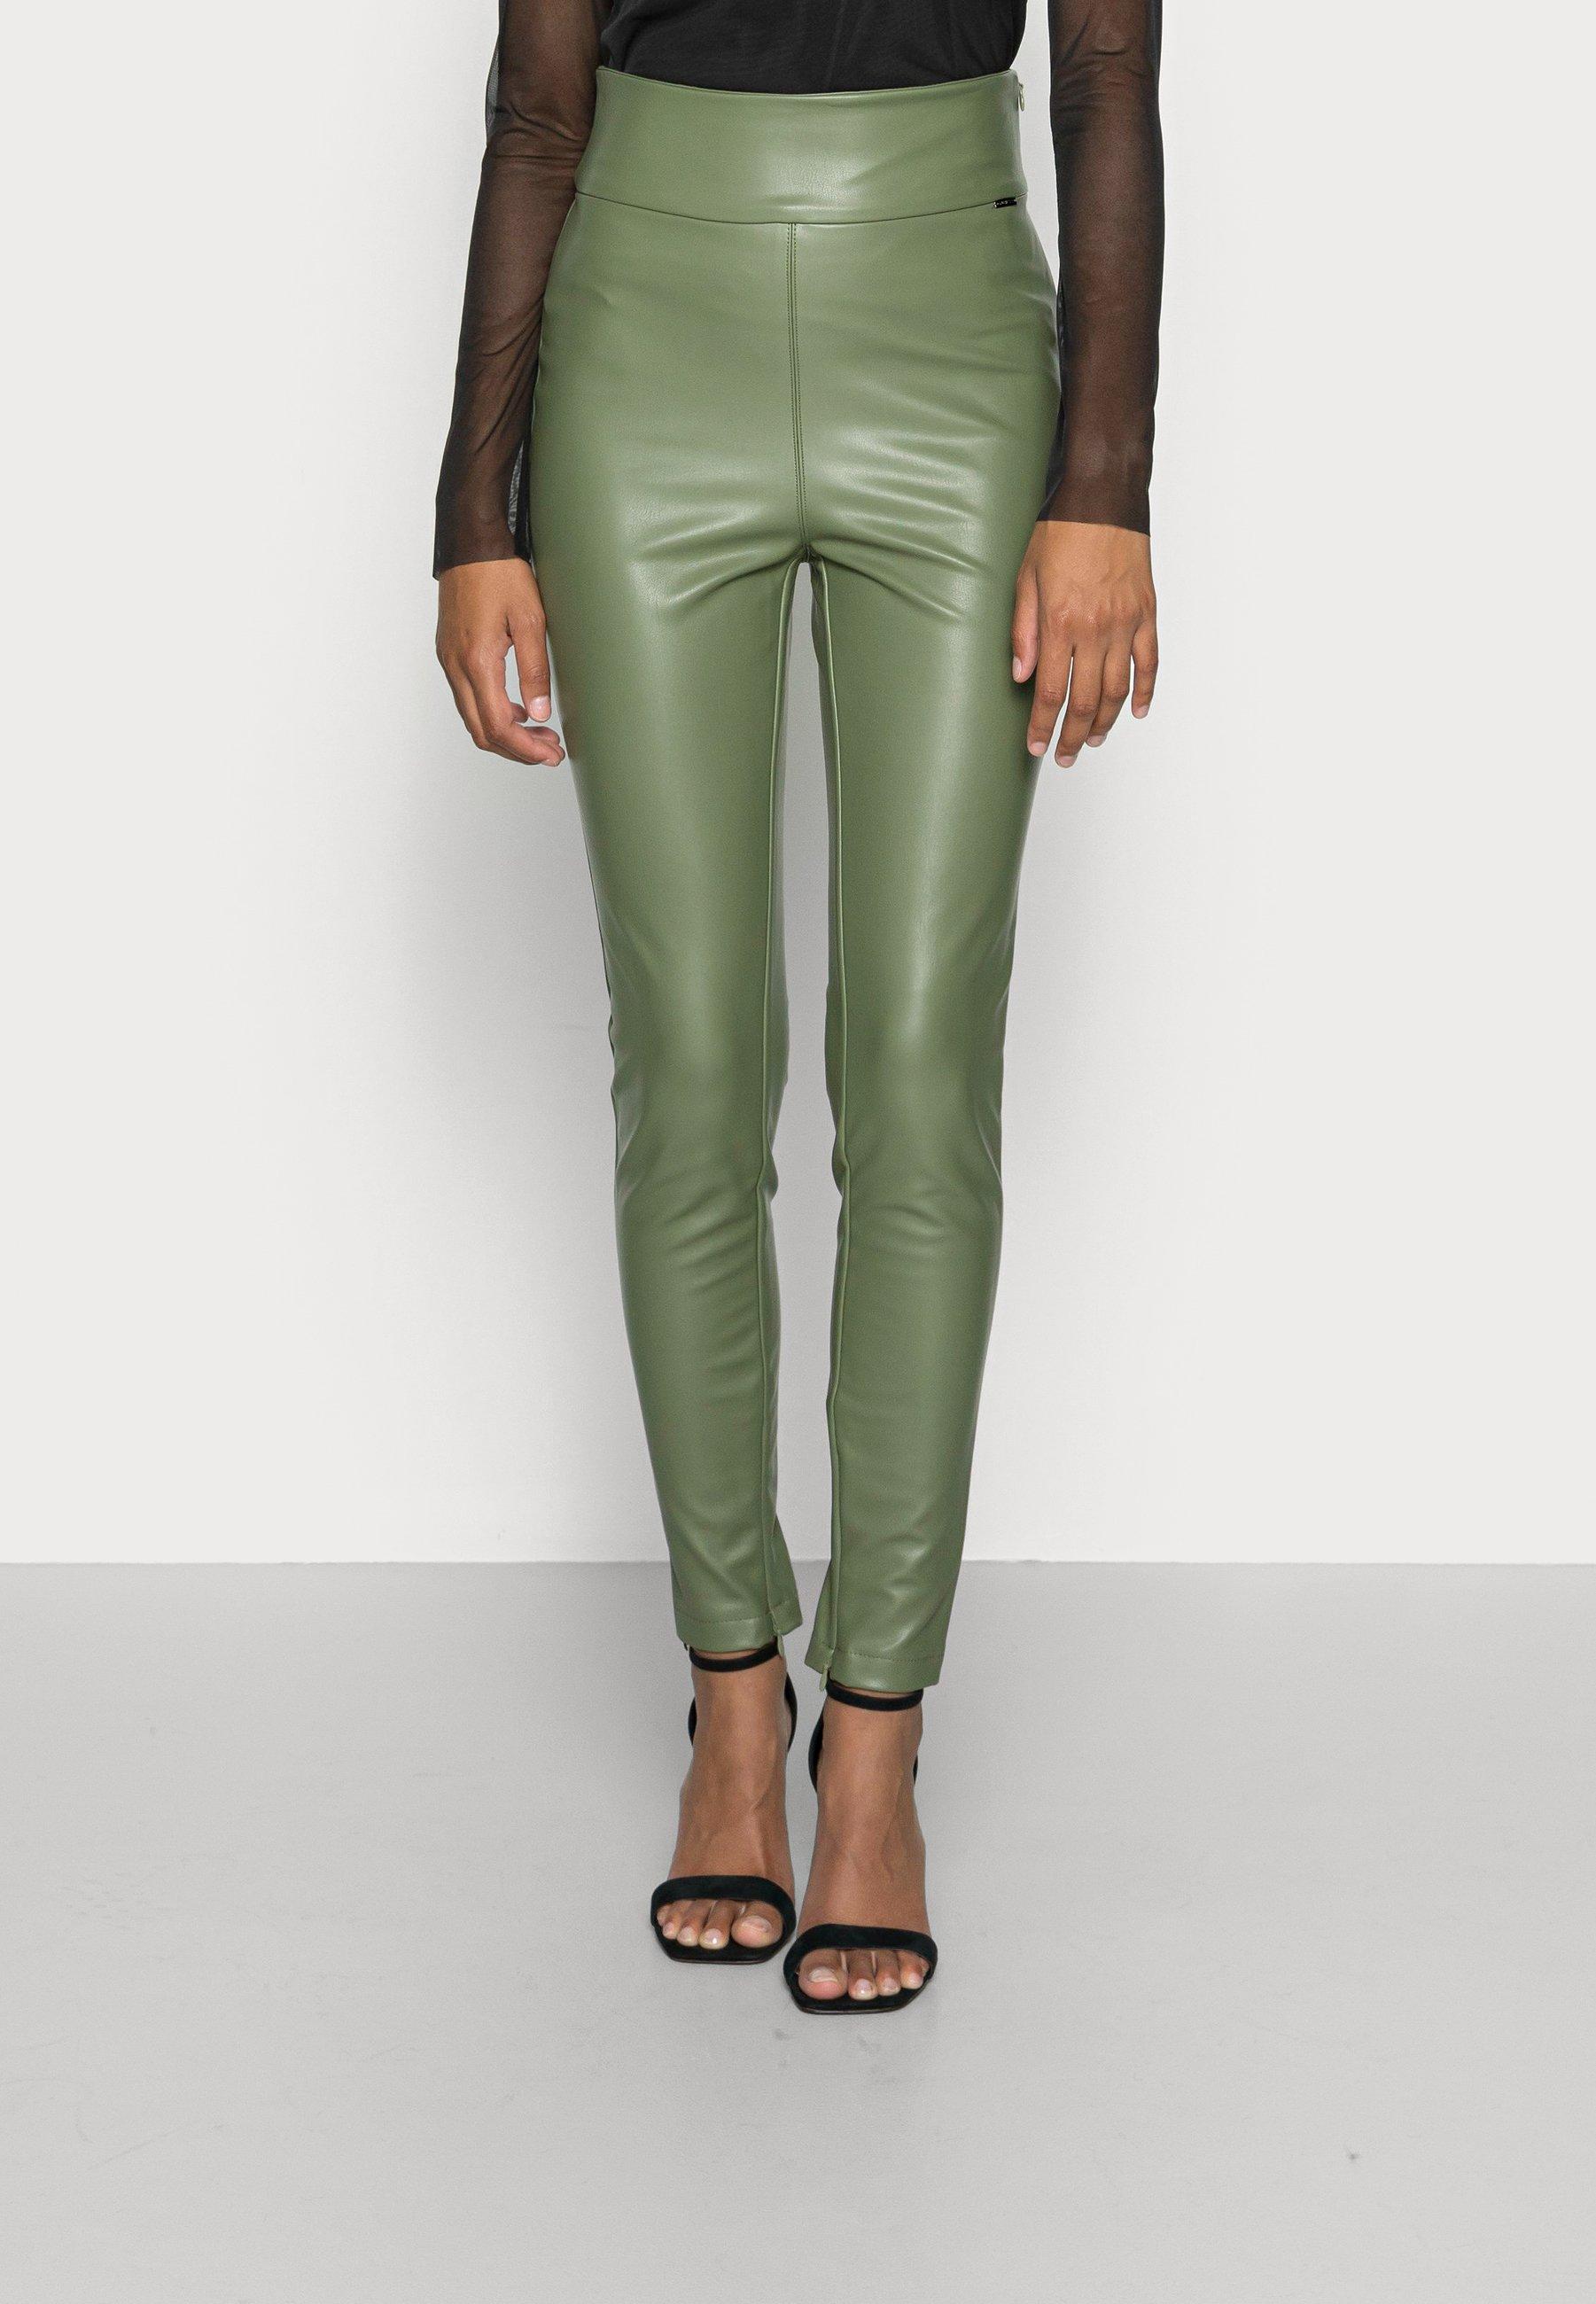 Damen PRISCILLA LEGGINGS - Leggings - Hosen